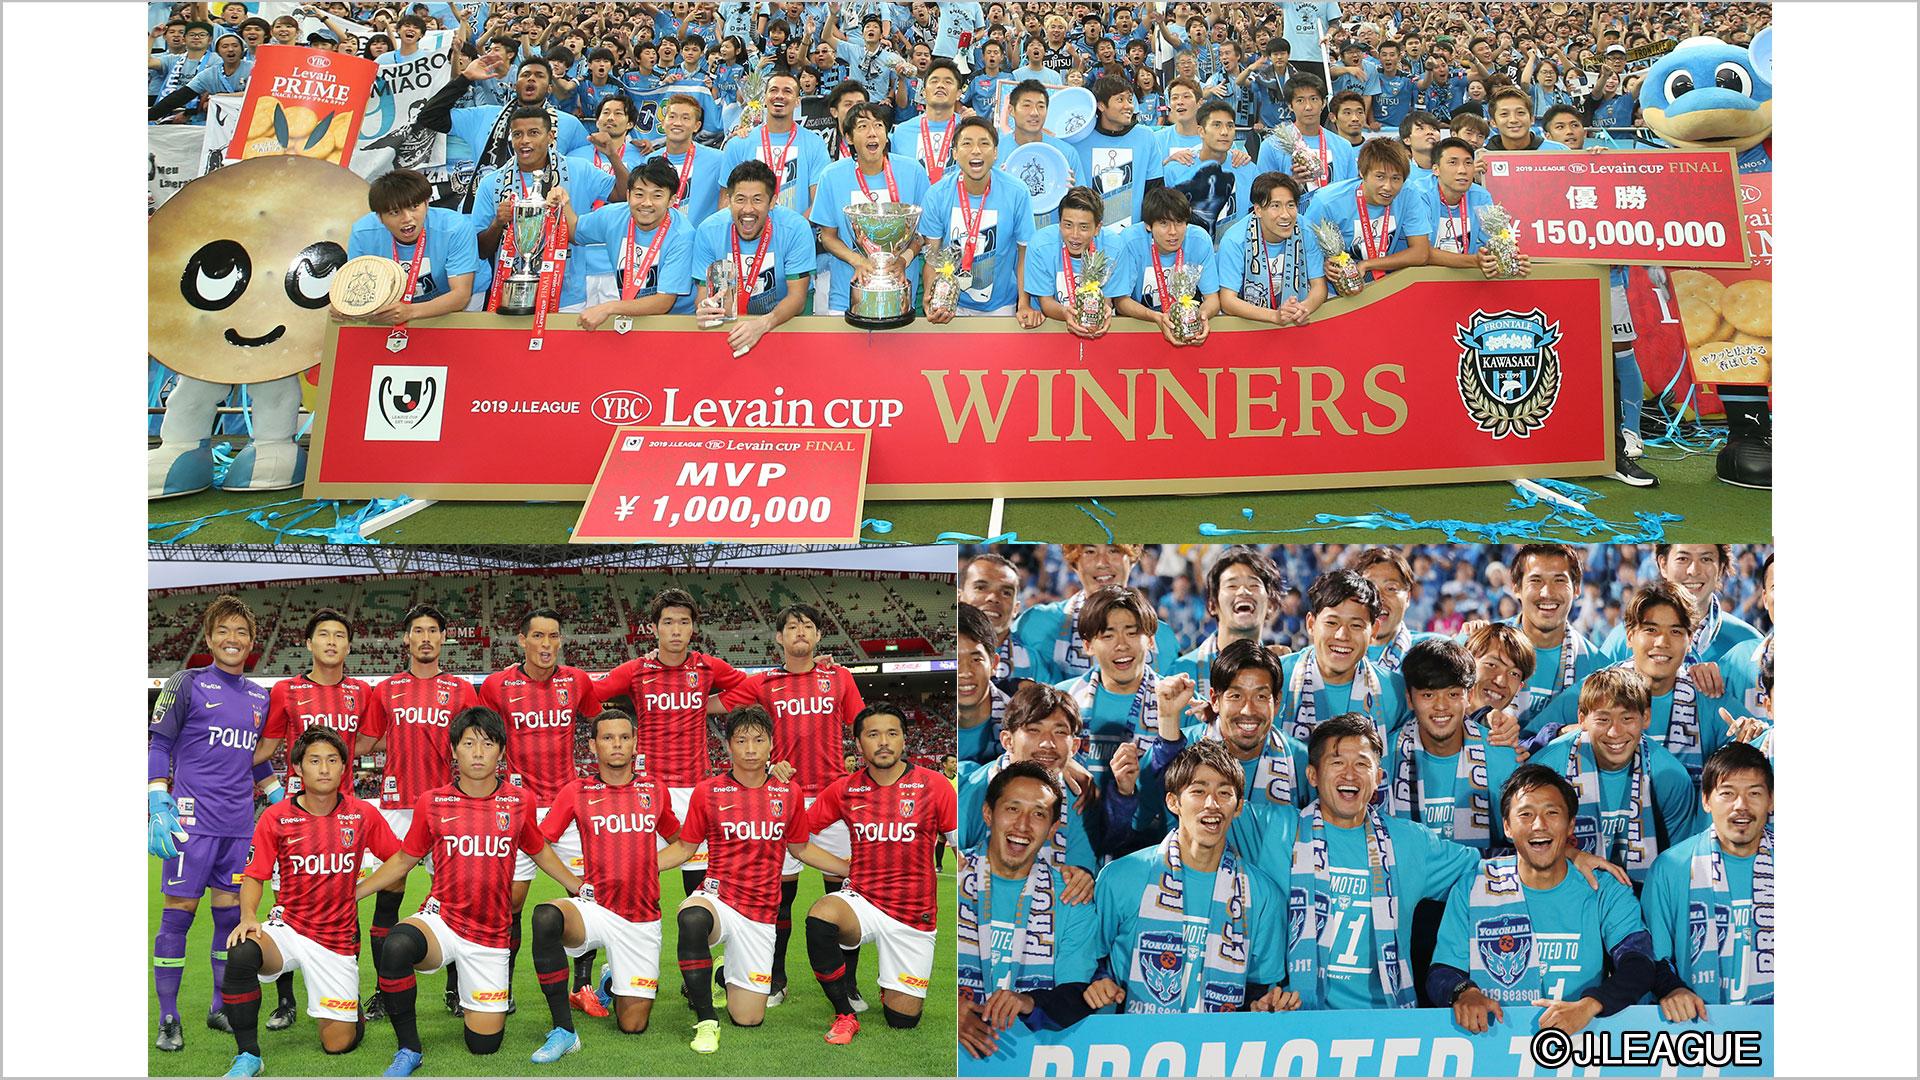 2020 JリーグYBCルヴァンカップ グループステージ 第2節 Cグループ 北海道コンサドーレ札幌 vs サンフレッチェ広島